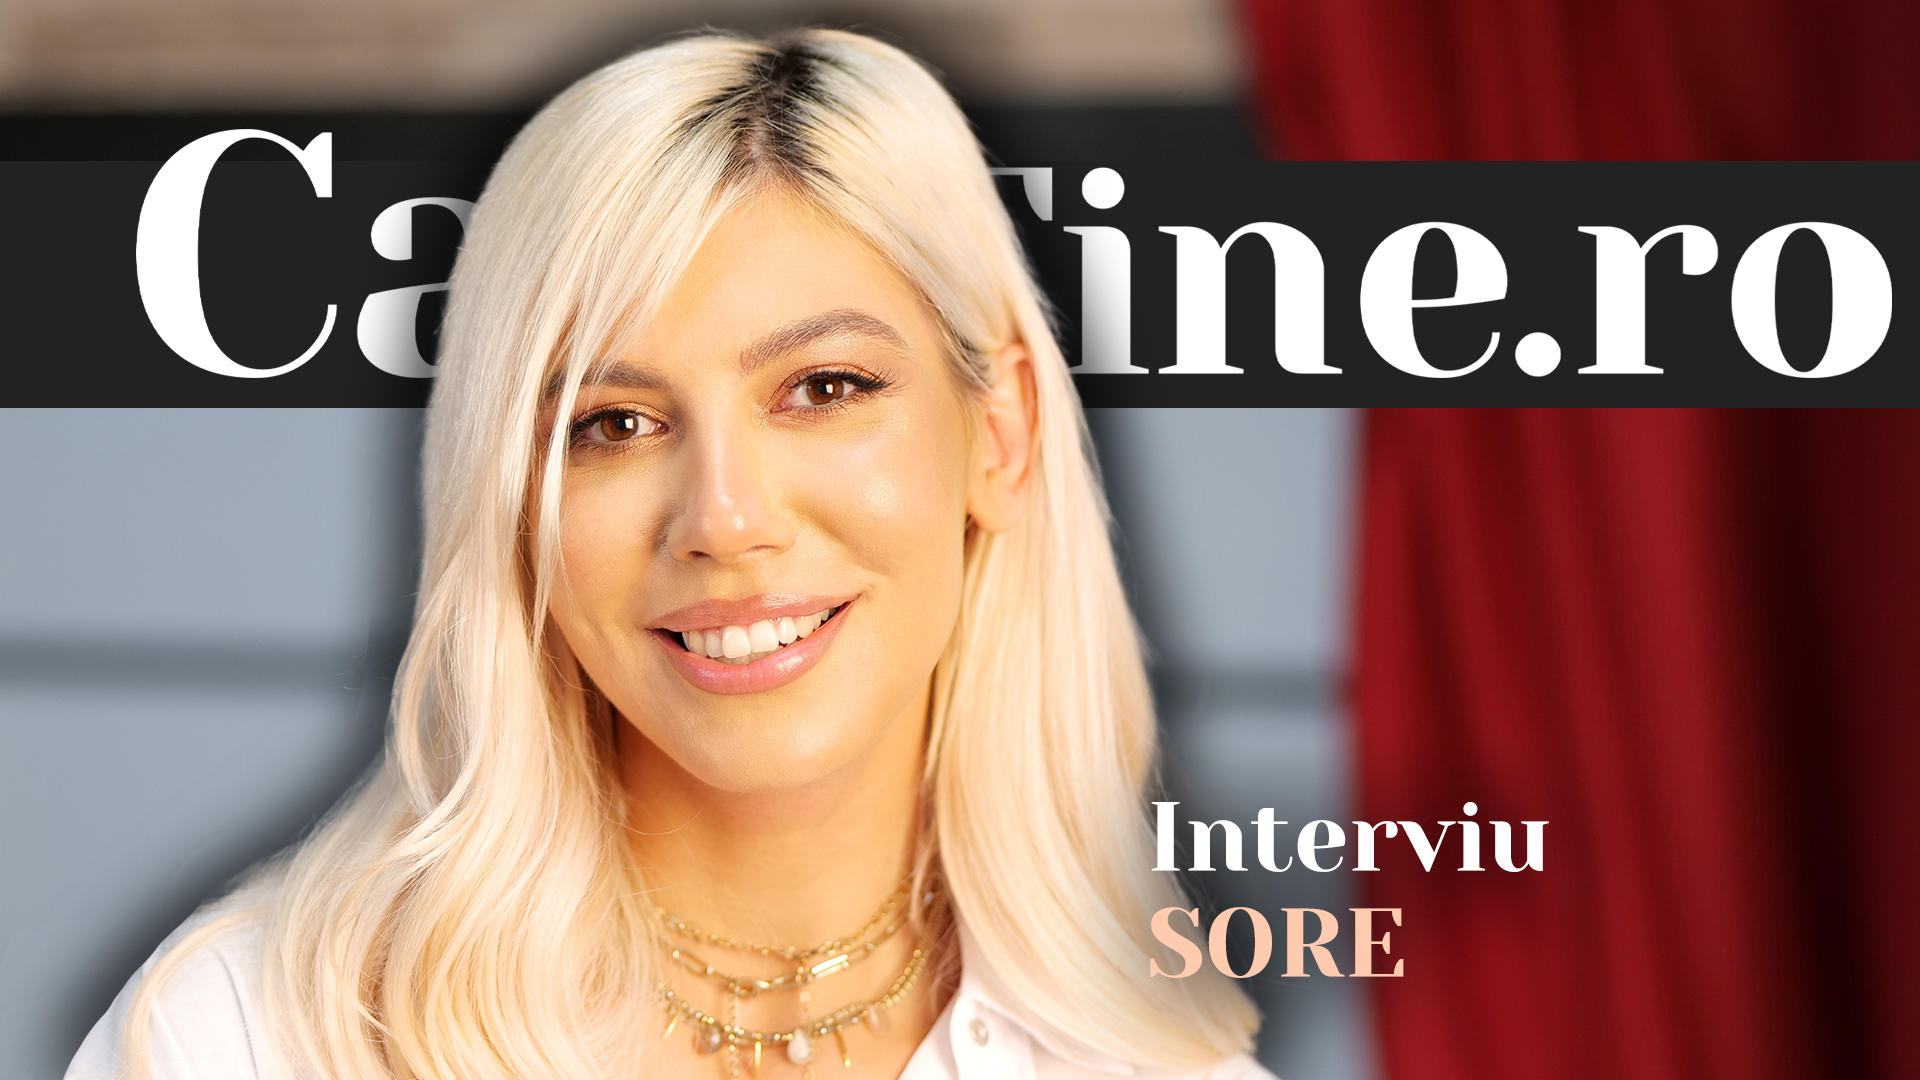 CaTine.Ro - Interviu SORE - Spontană